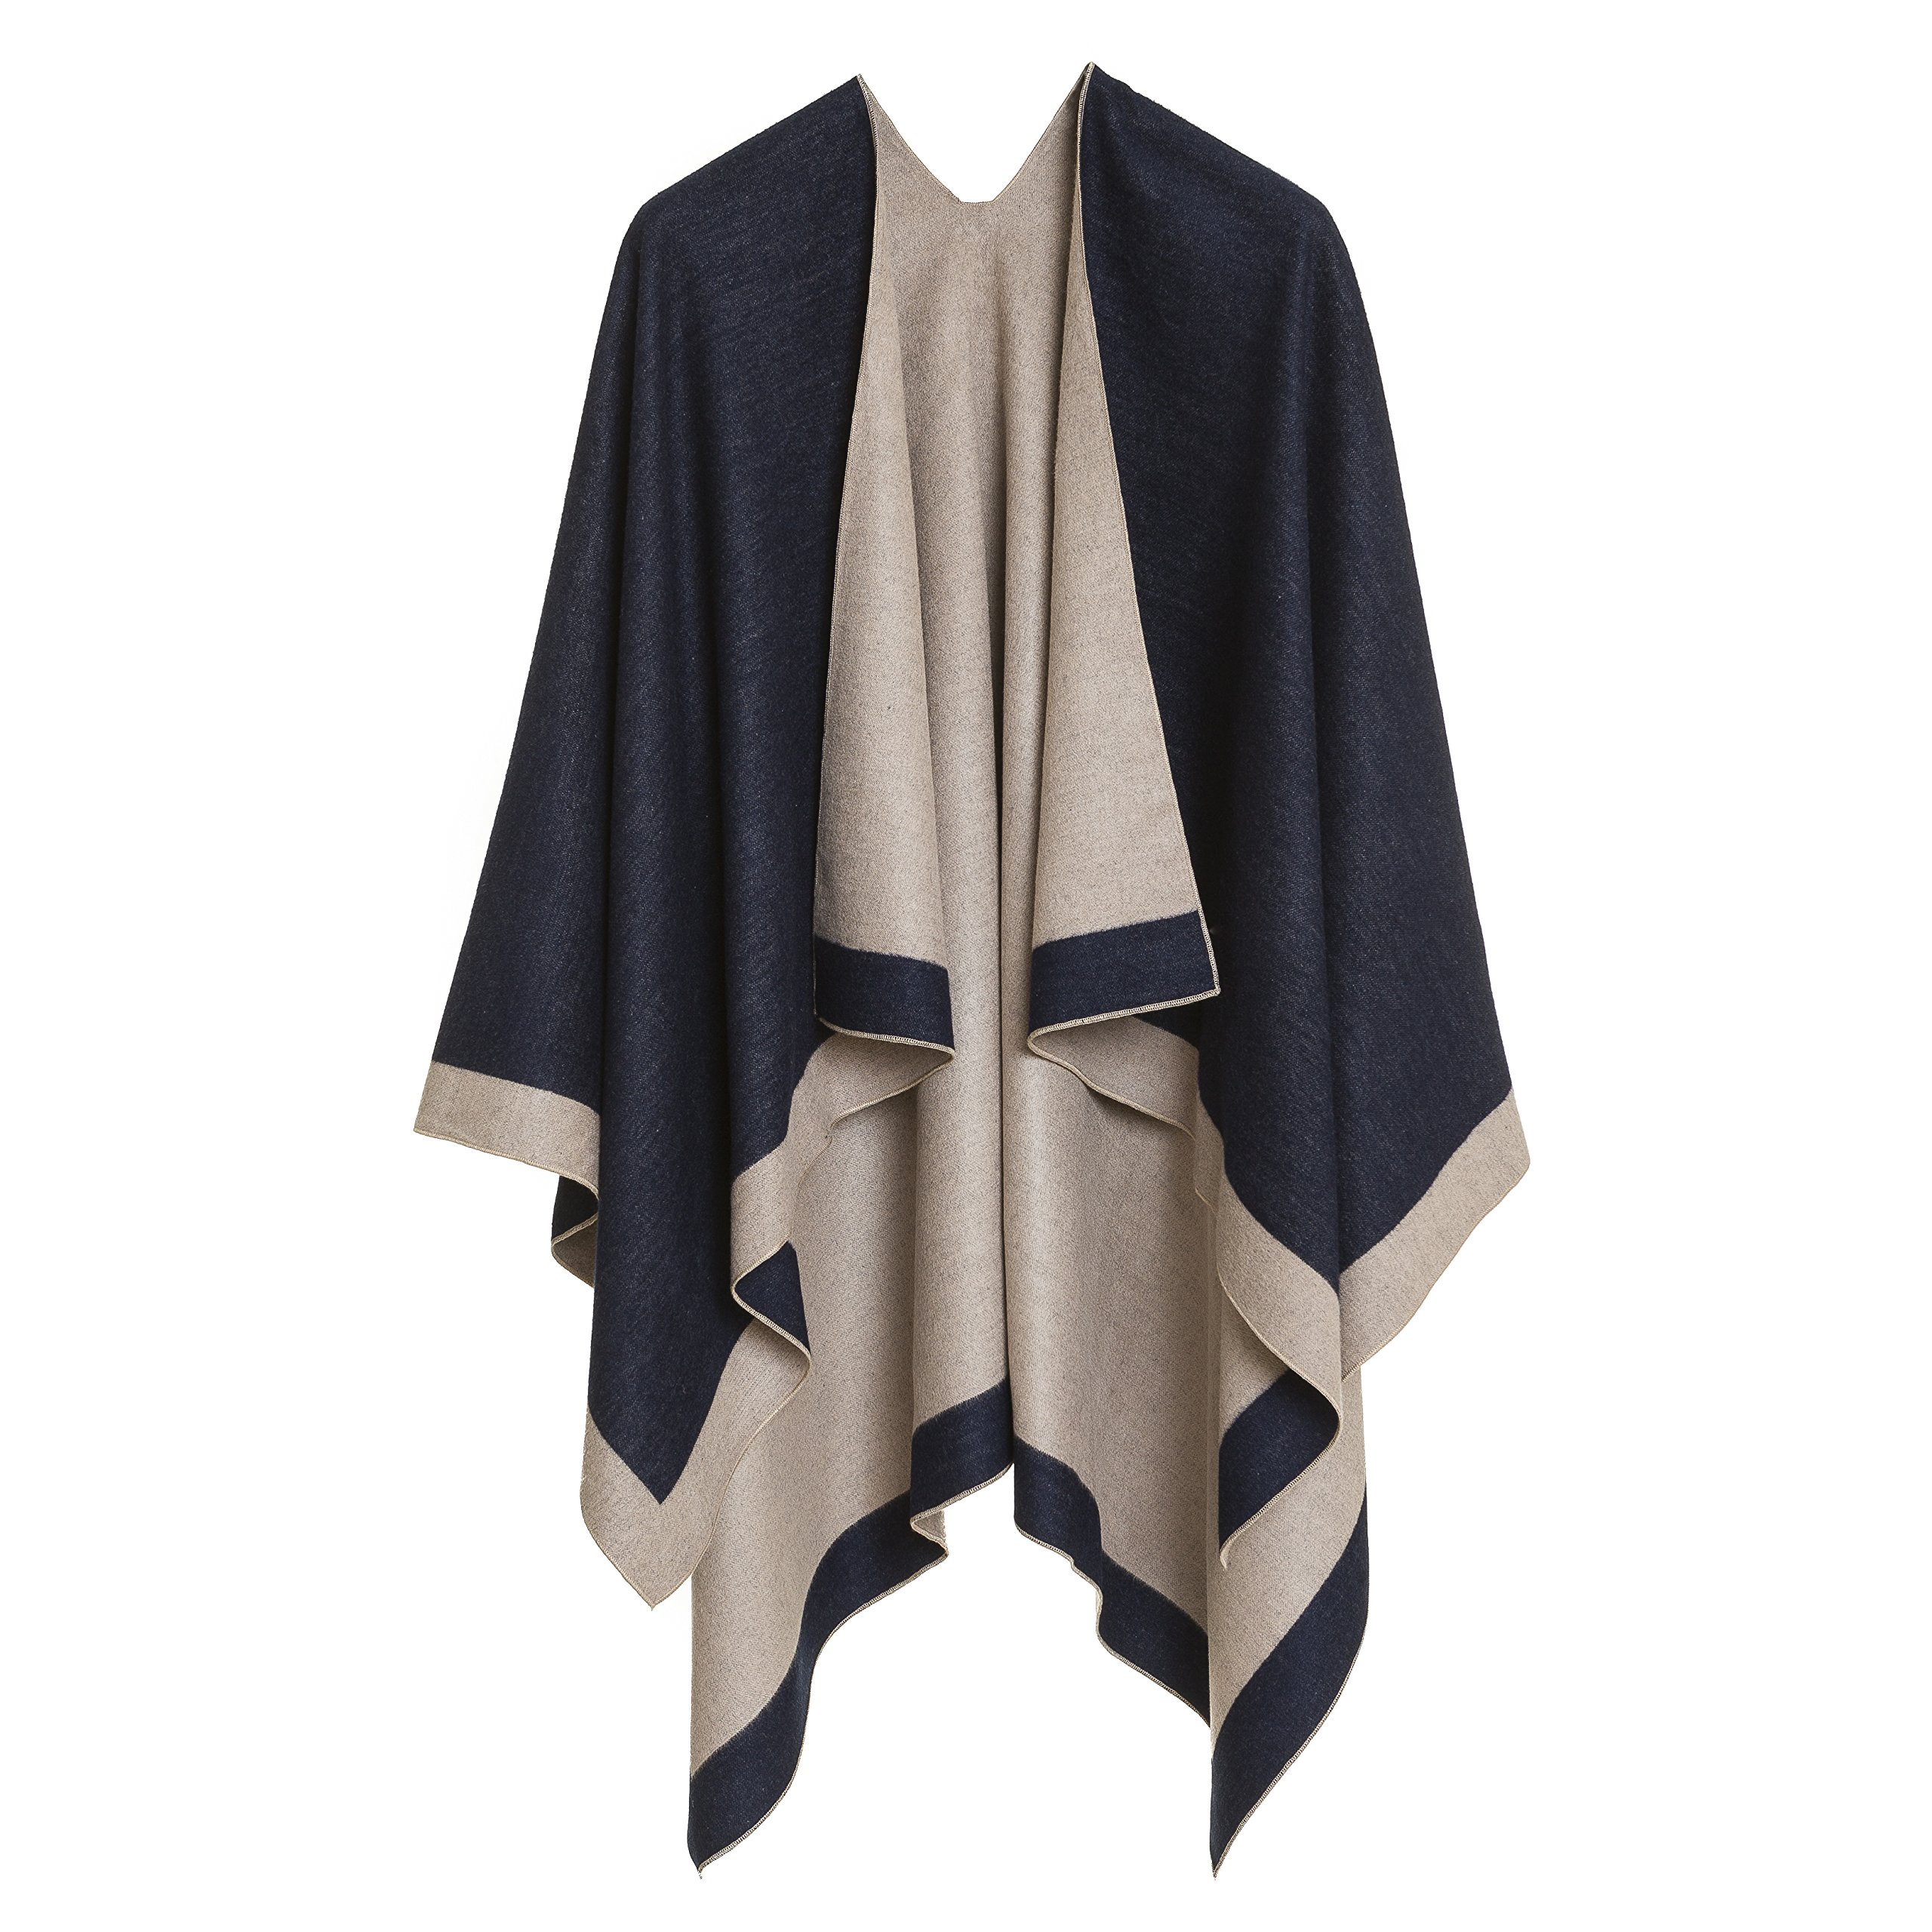 Cardigan Poncho Cape: Women Elegant Gray Grey Navy Blue Cardigan Shawl Wrap Sweater Coat for Winter (Navy Beige)